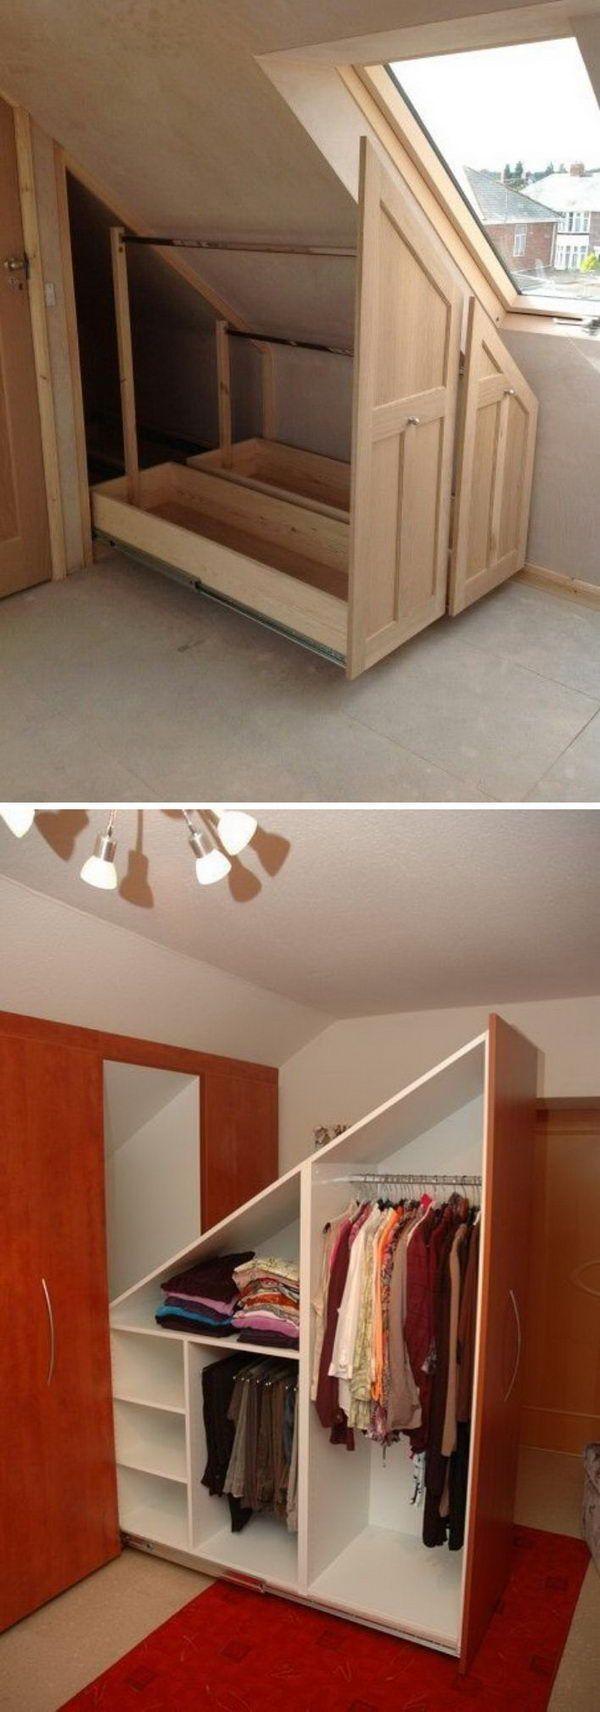 20+ smart storage ideas for your attic – making diyselber#attic #diyselber #idea…